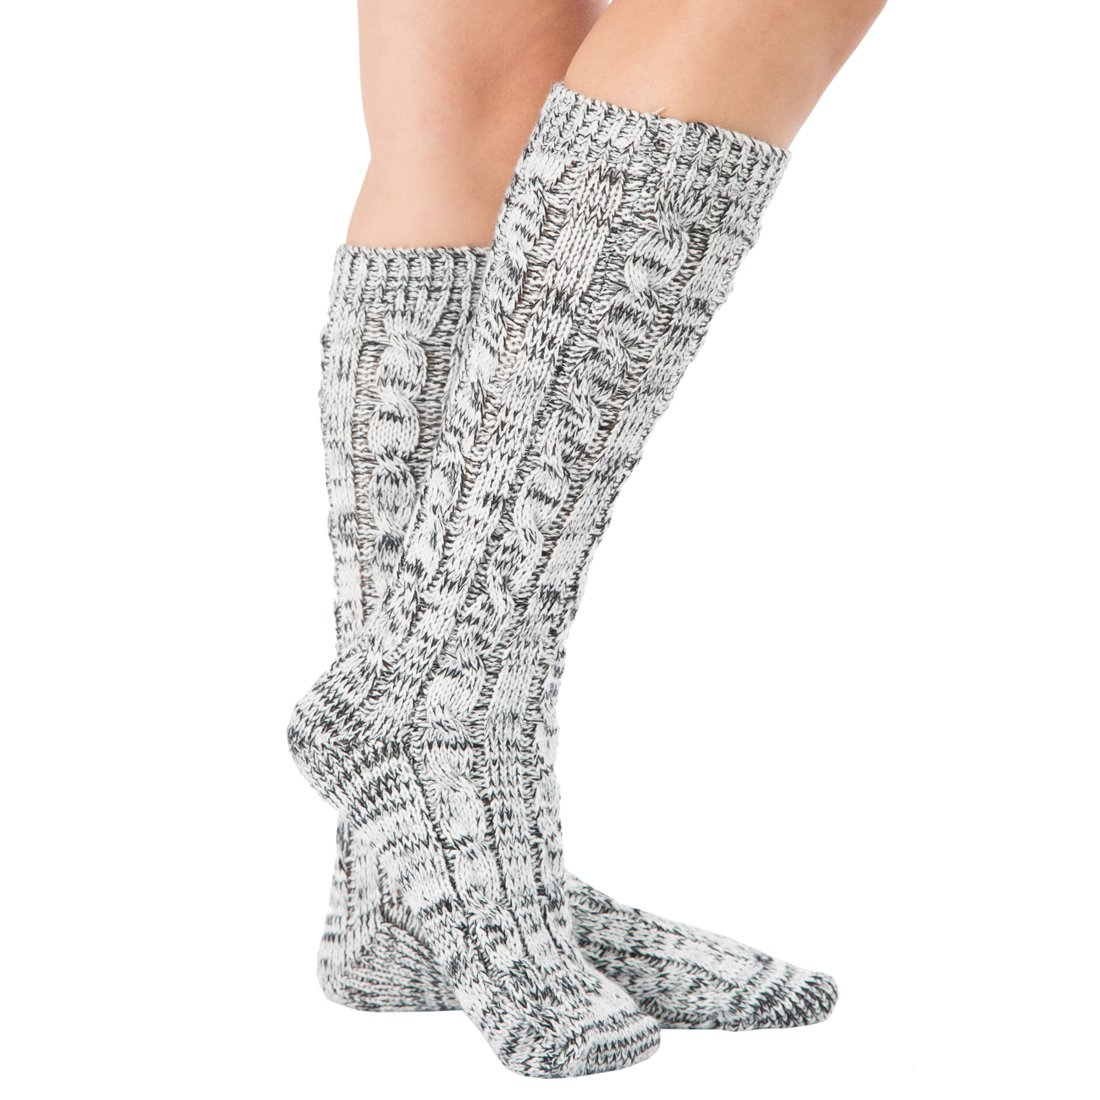 Women Slipper Crew Floor Cozy Socks House Cable Knit Leg Warmers Knee High Length for Winter SCK60040WTBK